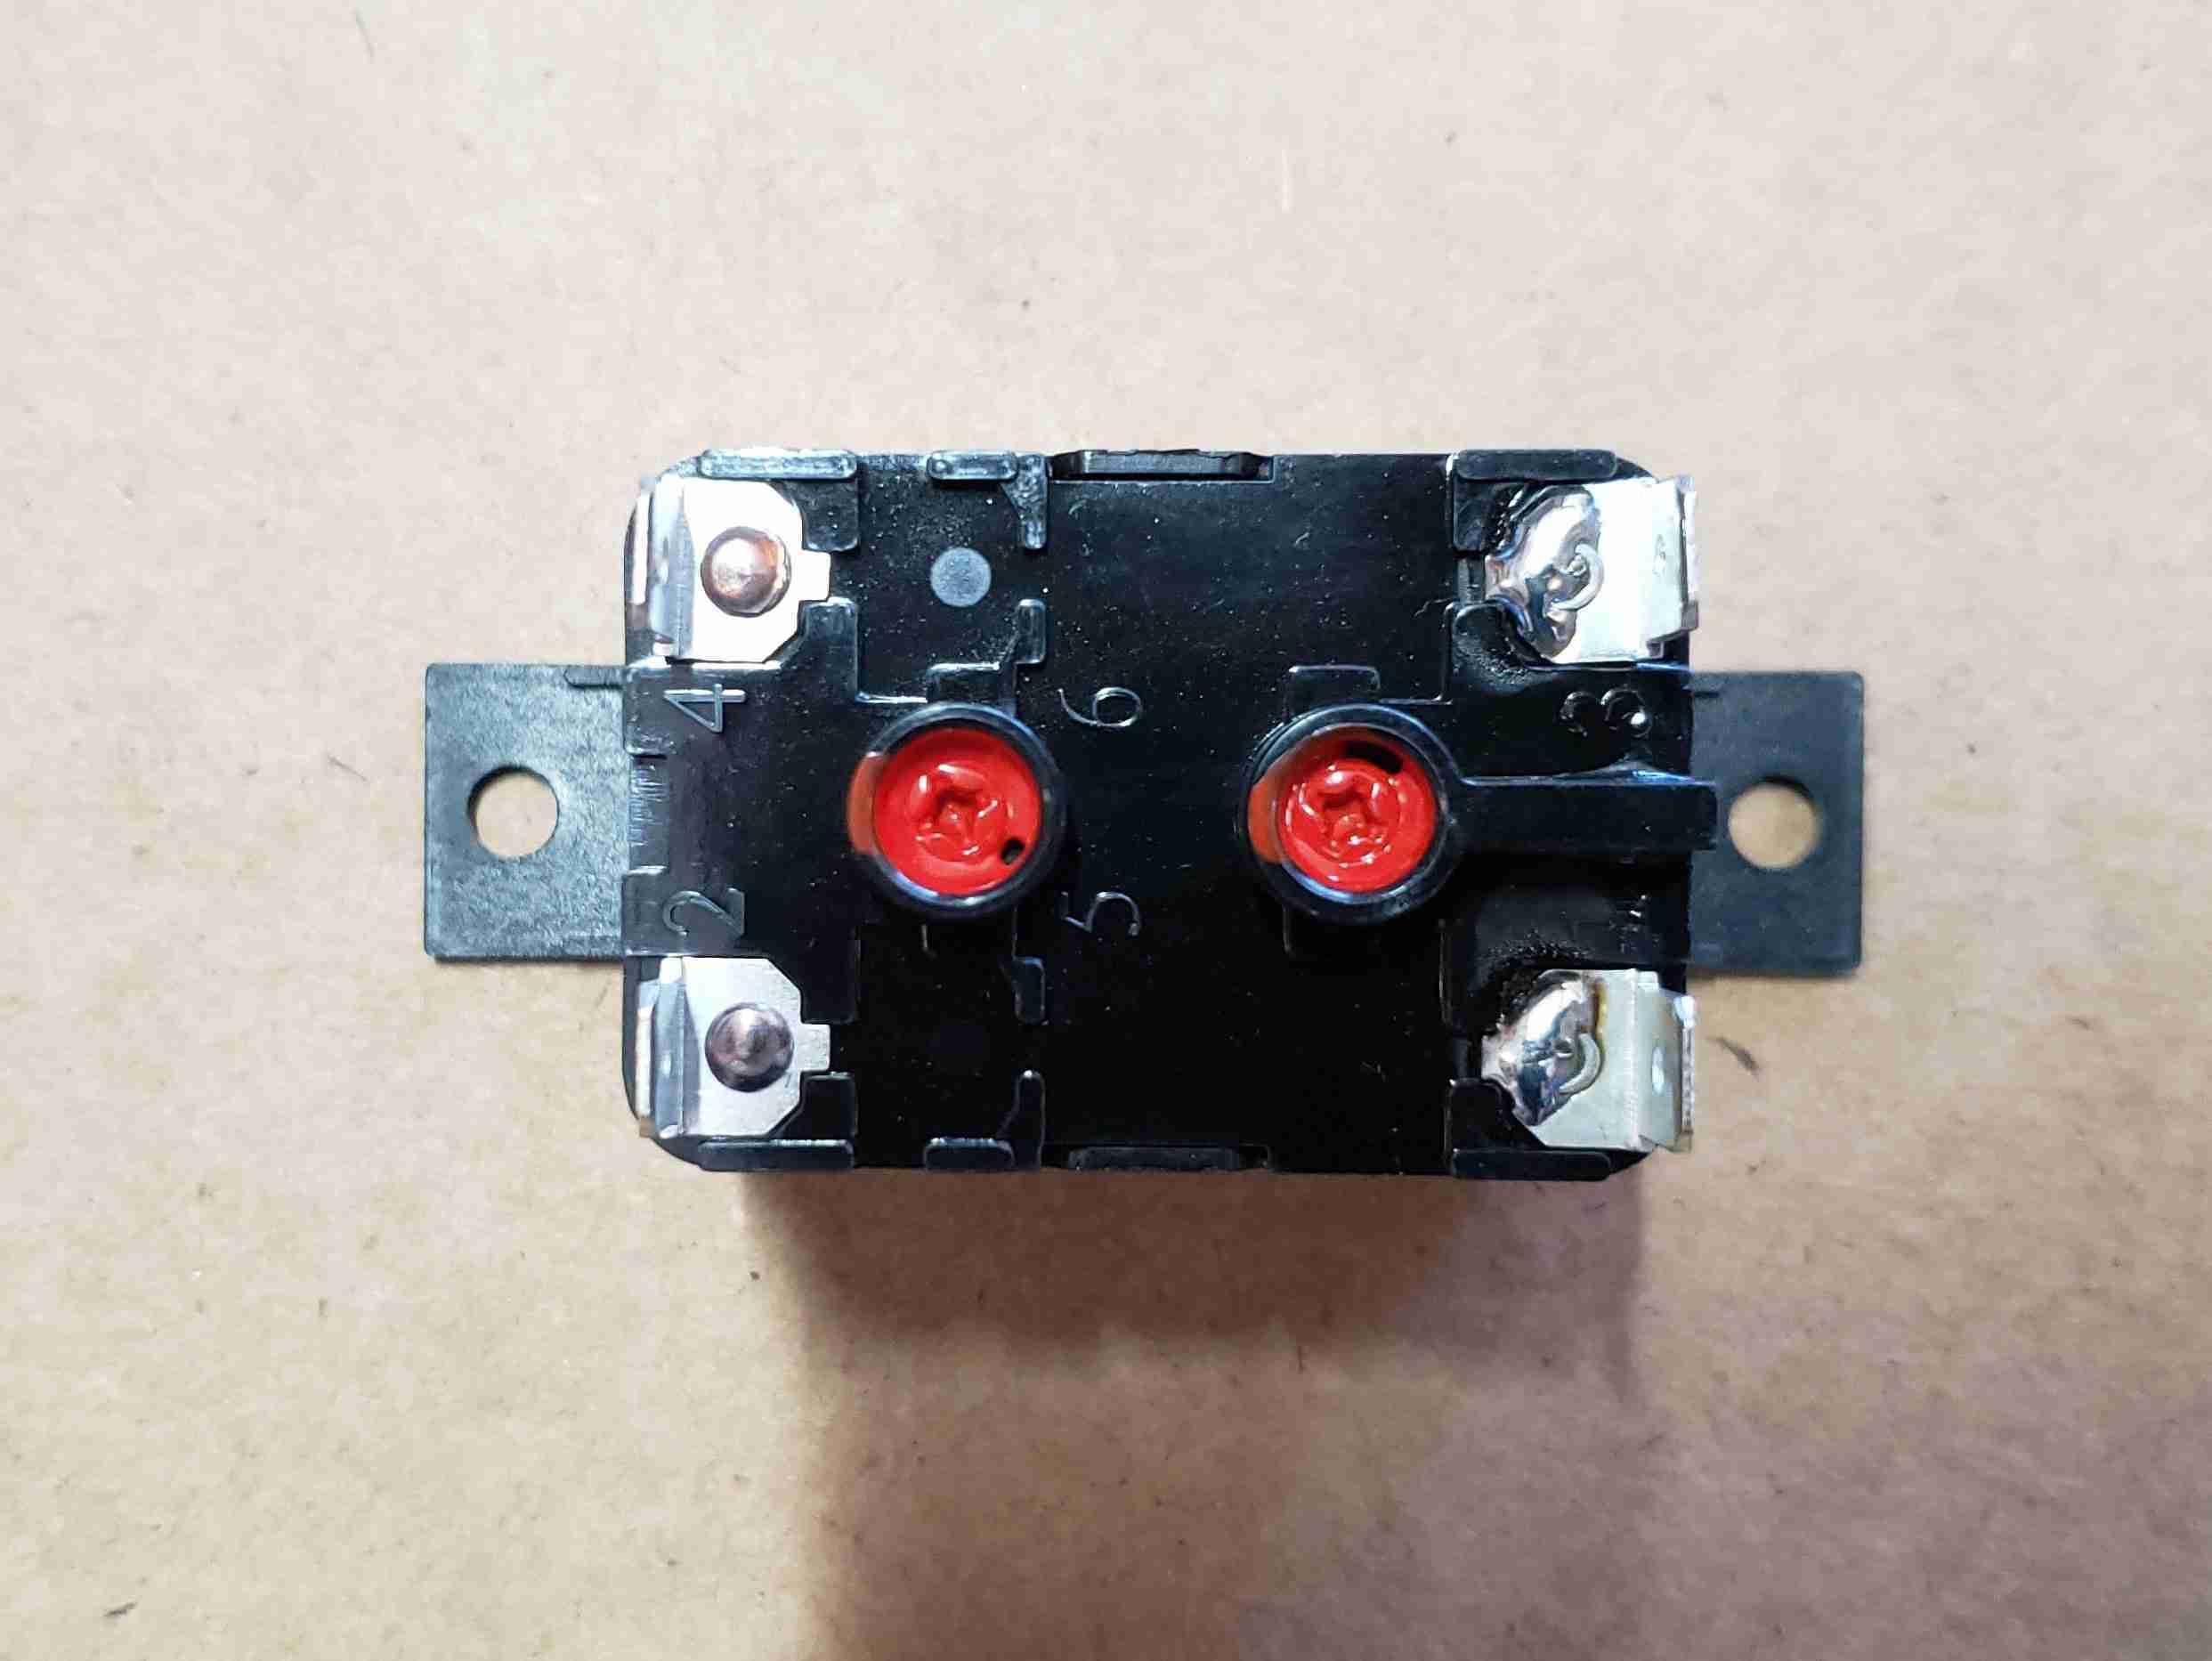 Bottom view of Fan Relay for Heat Pump Display Retrofit Kit